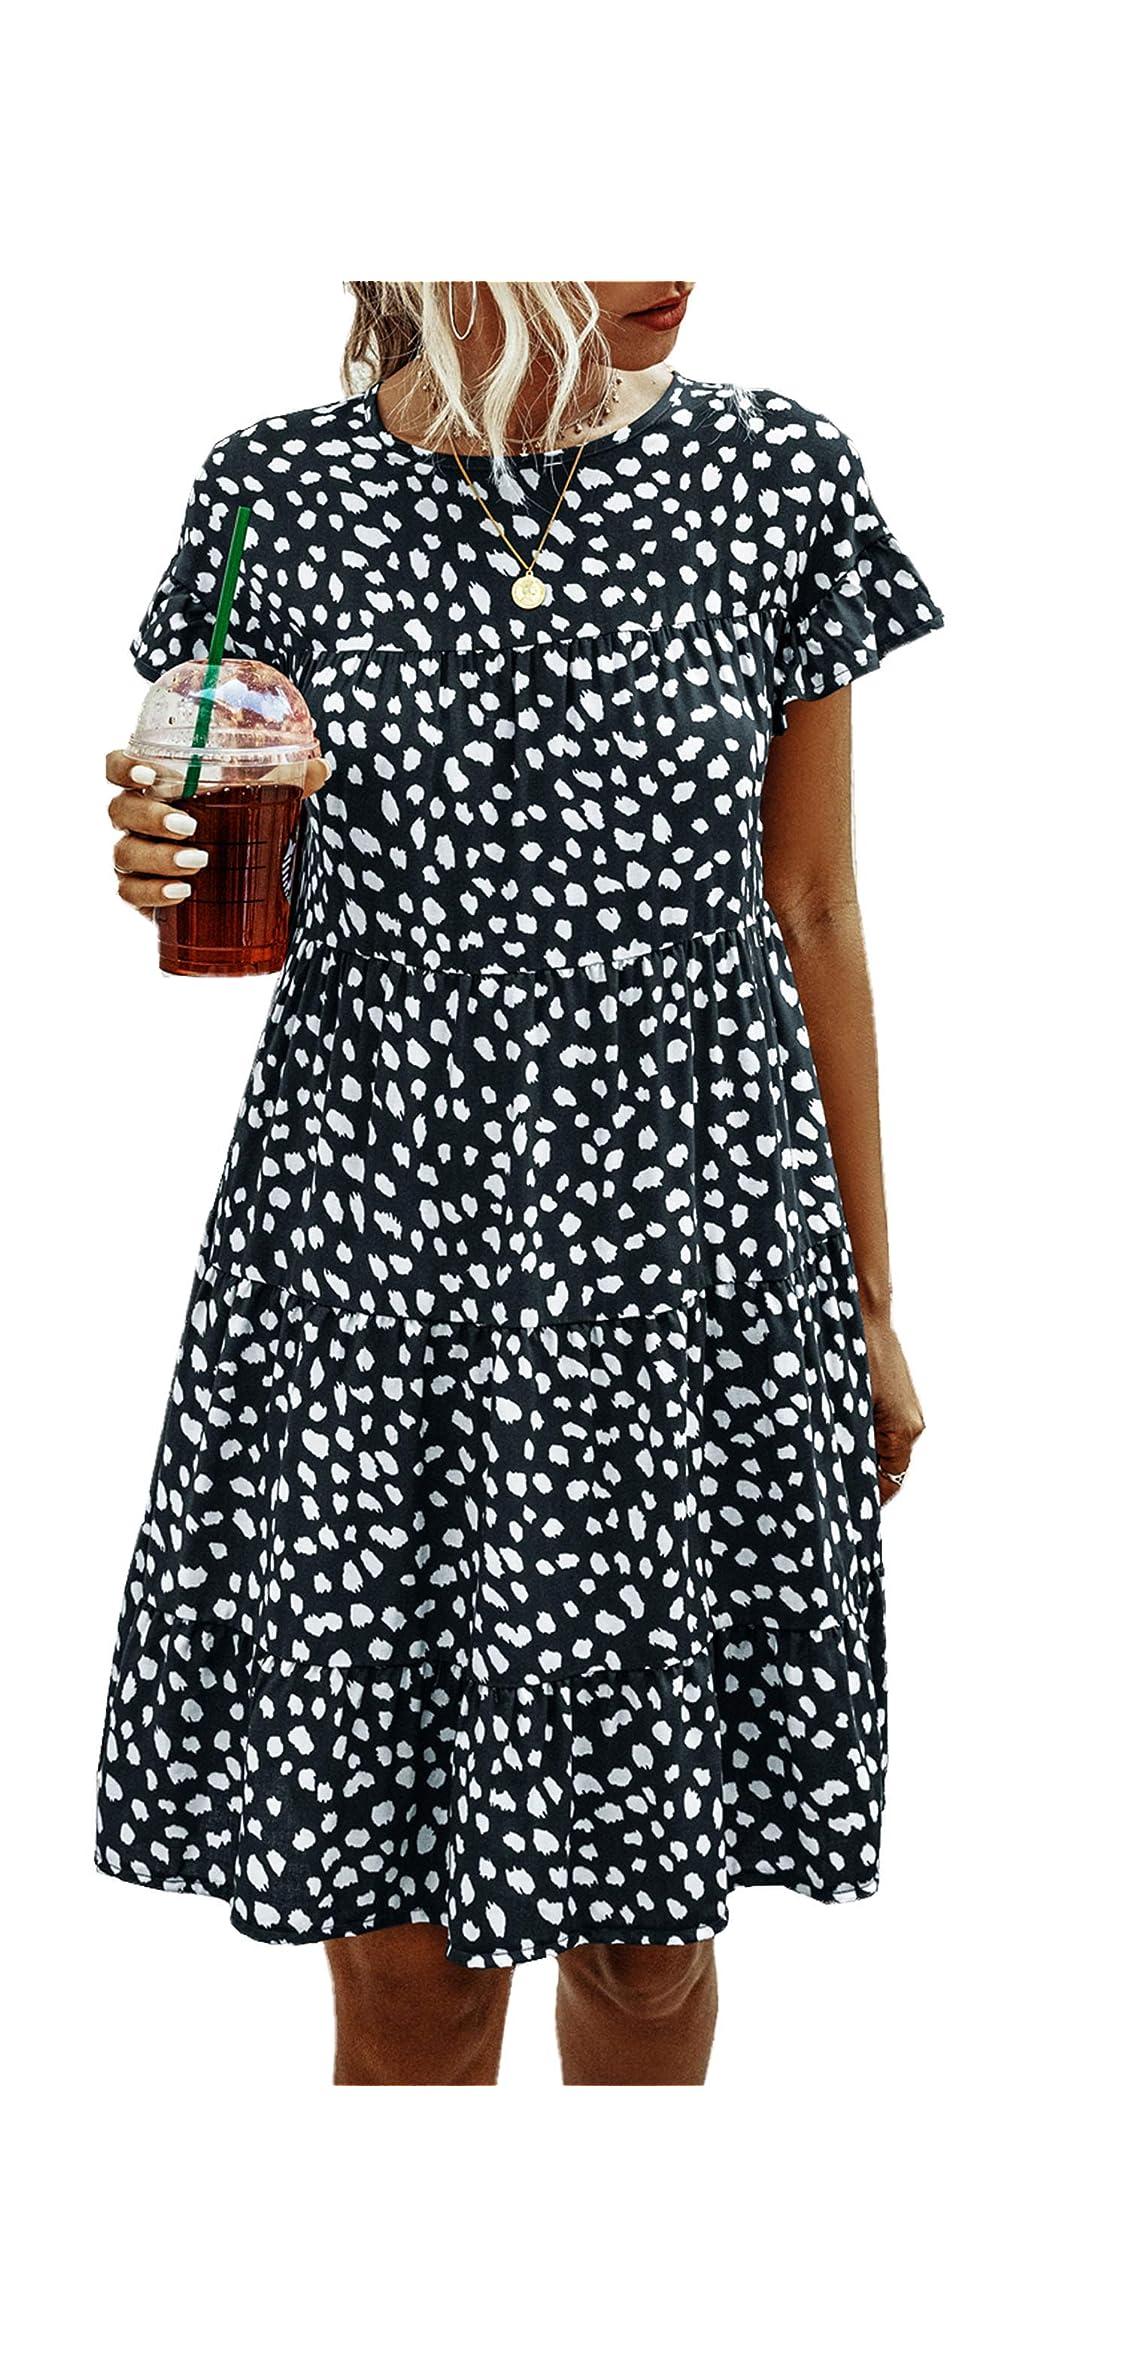 Womens Summer Tunic Dress Round Neck Short Sleeve